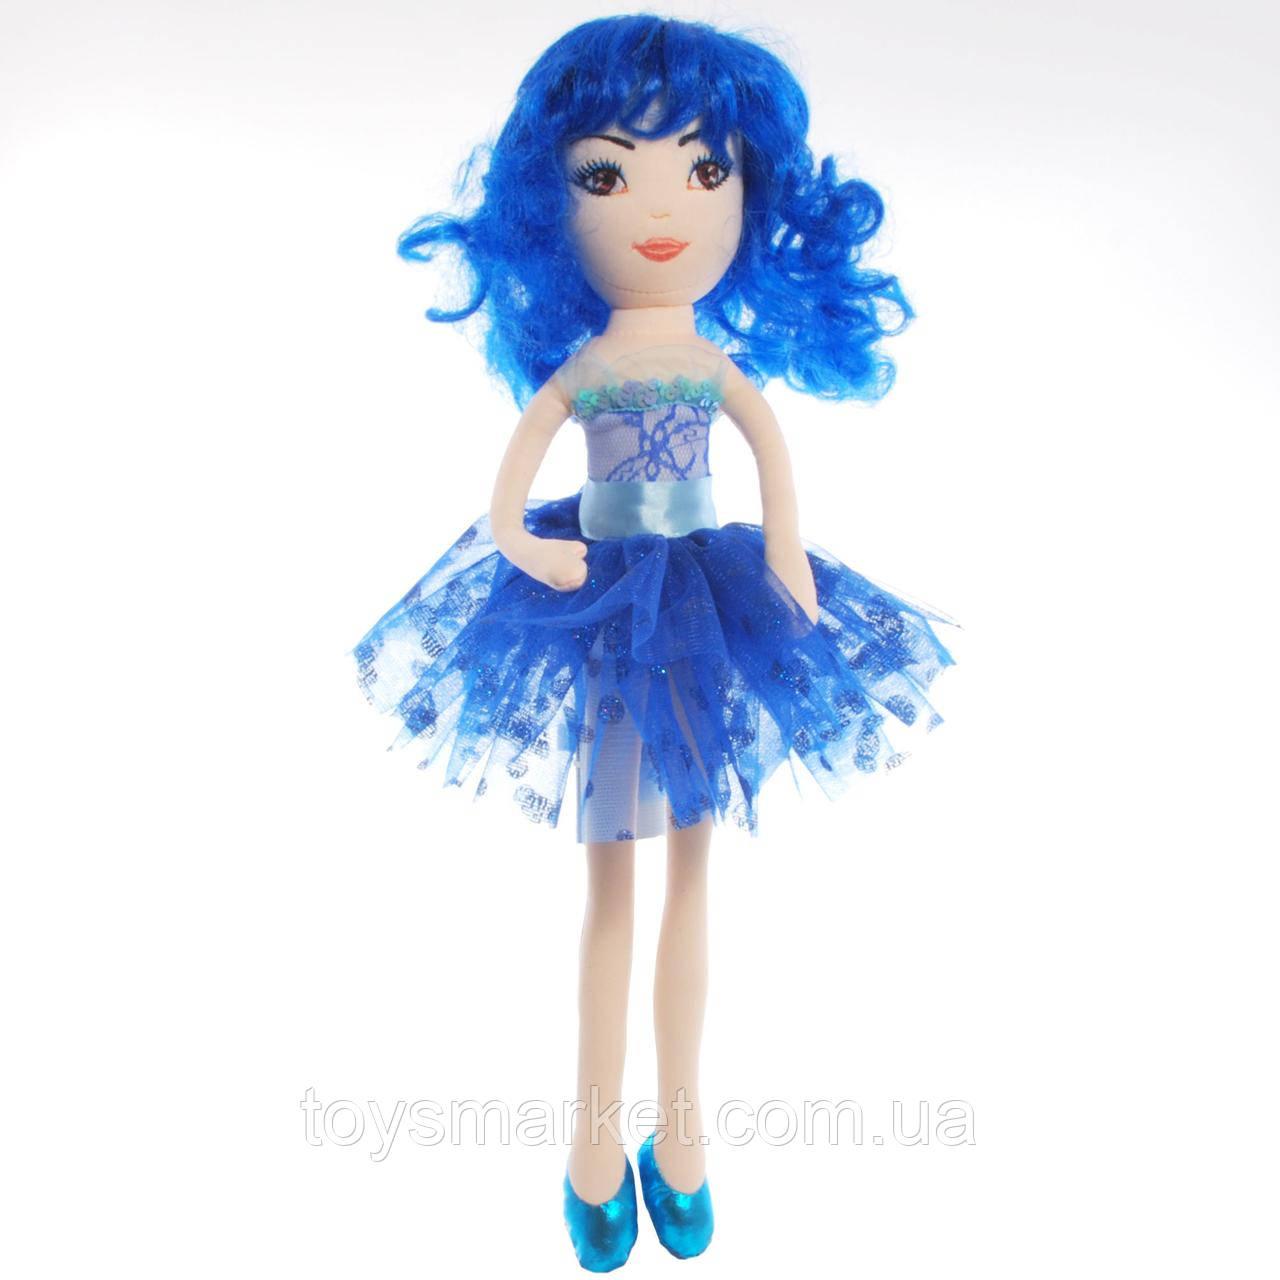 Детская игрушка кукла Вероника